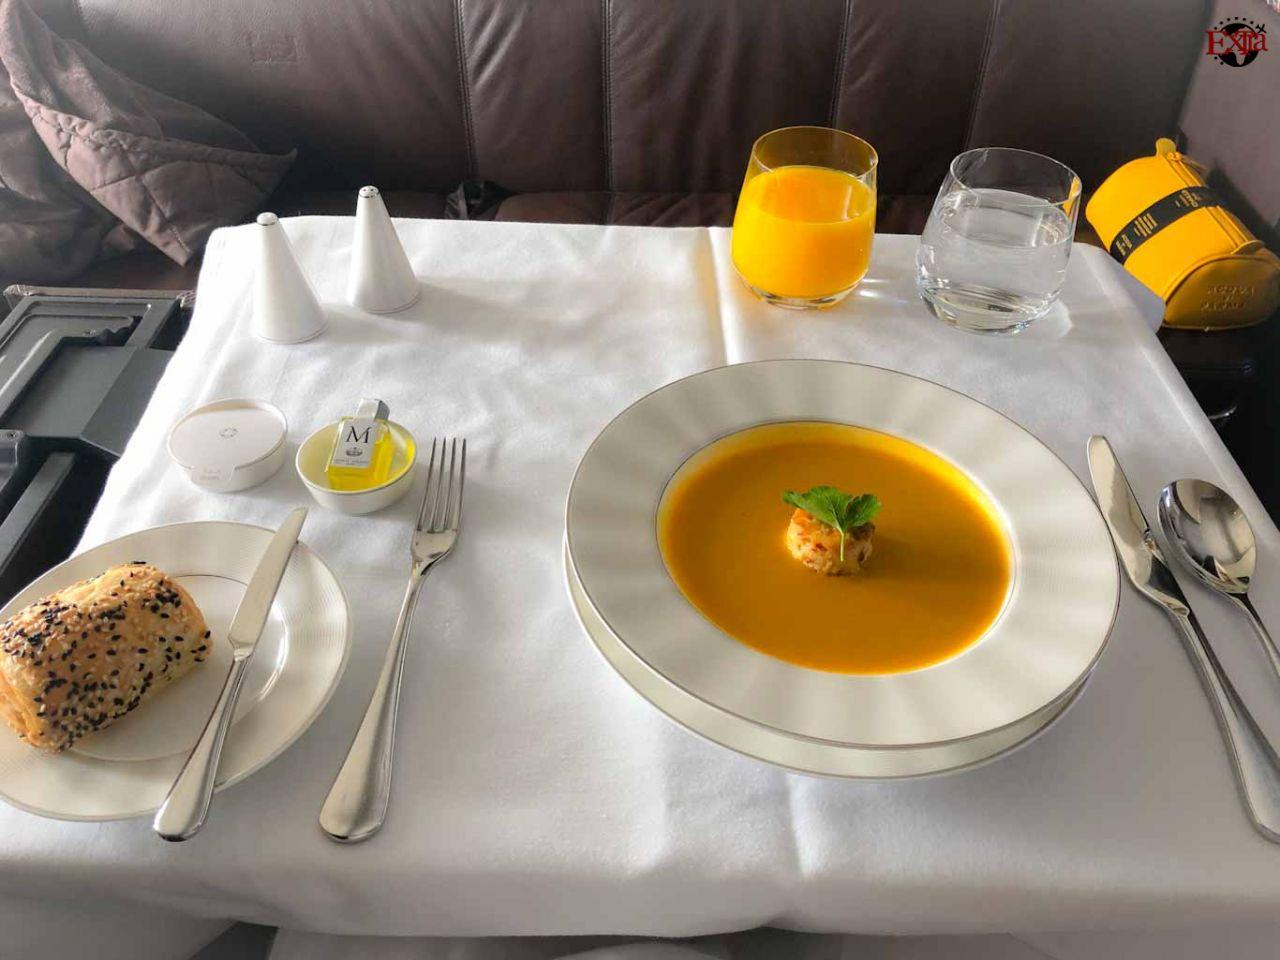 Etihad Airways First Class Food Starter